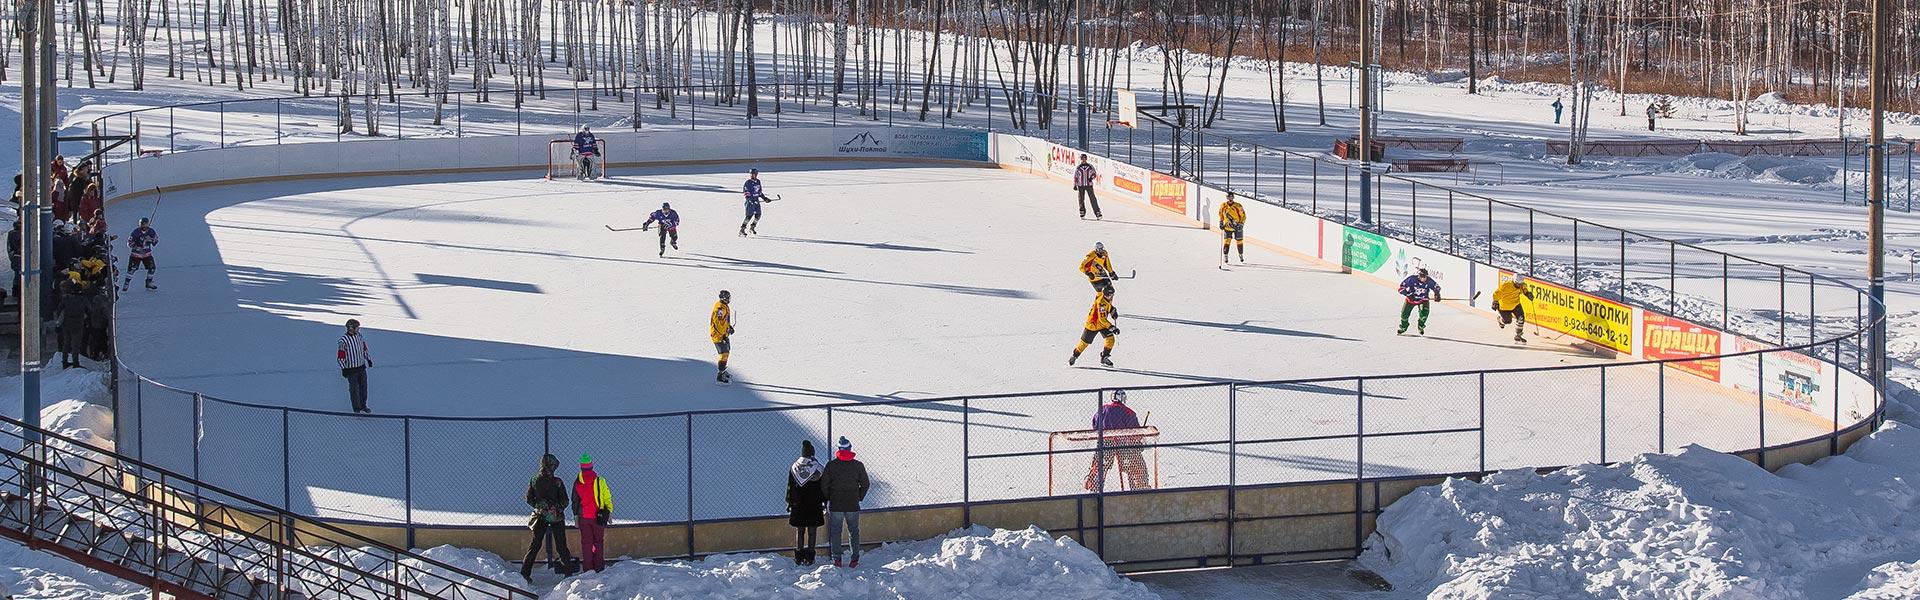 fon-hockey-kor